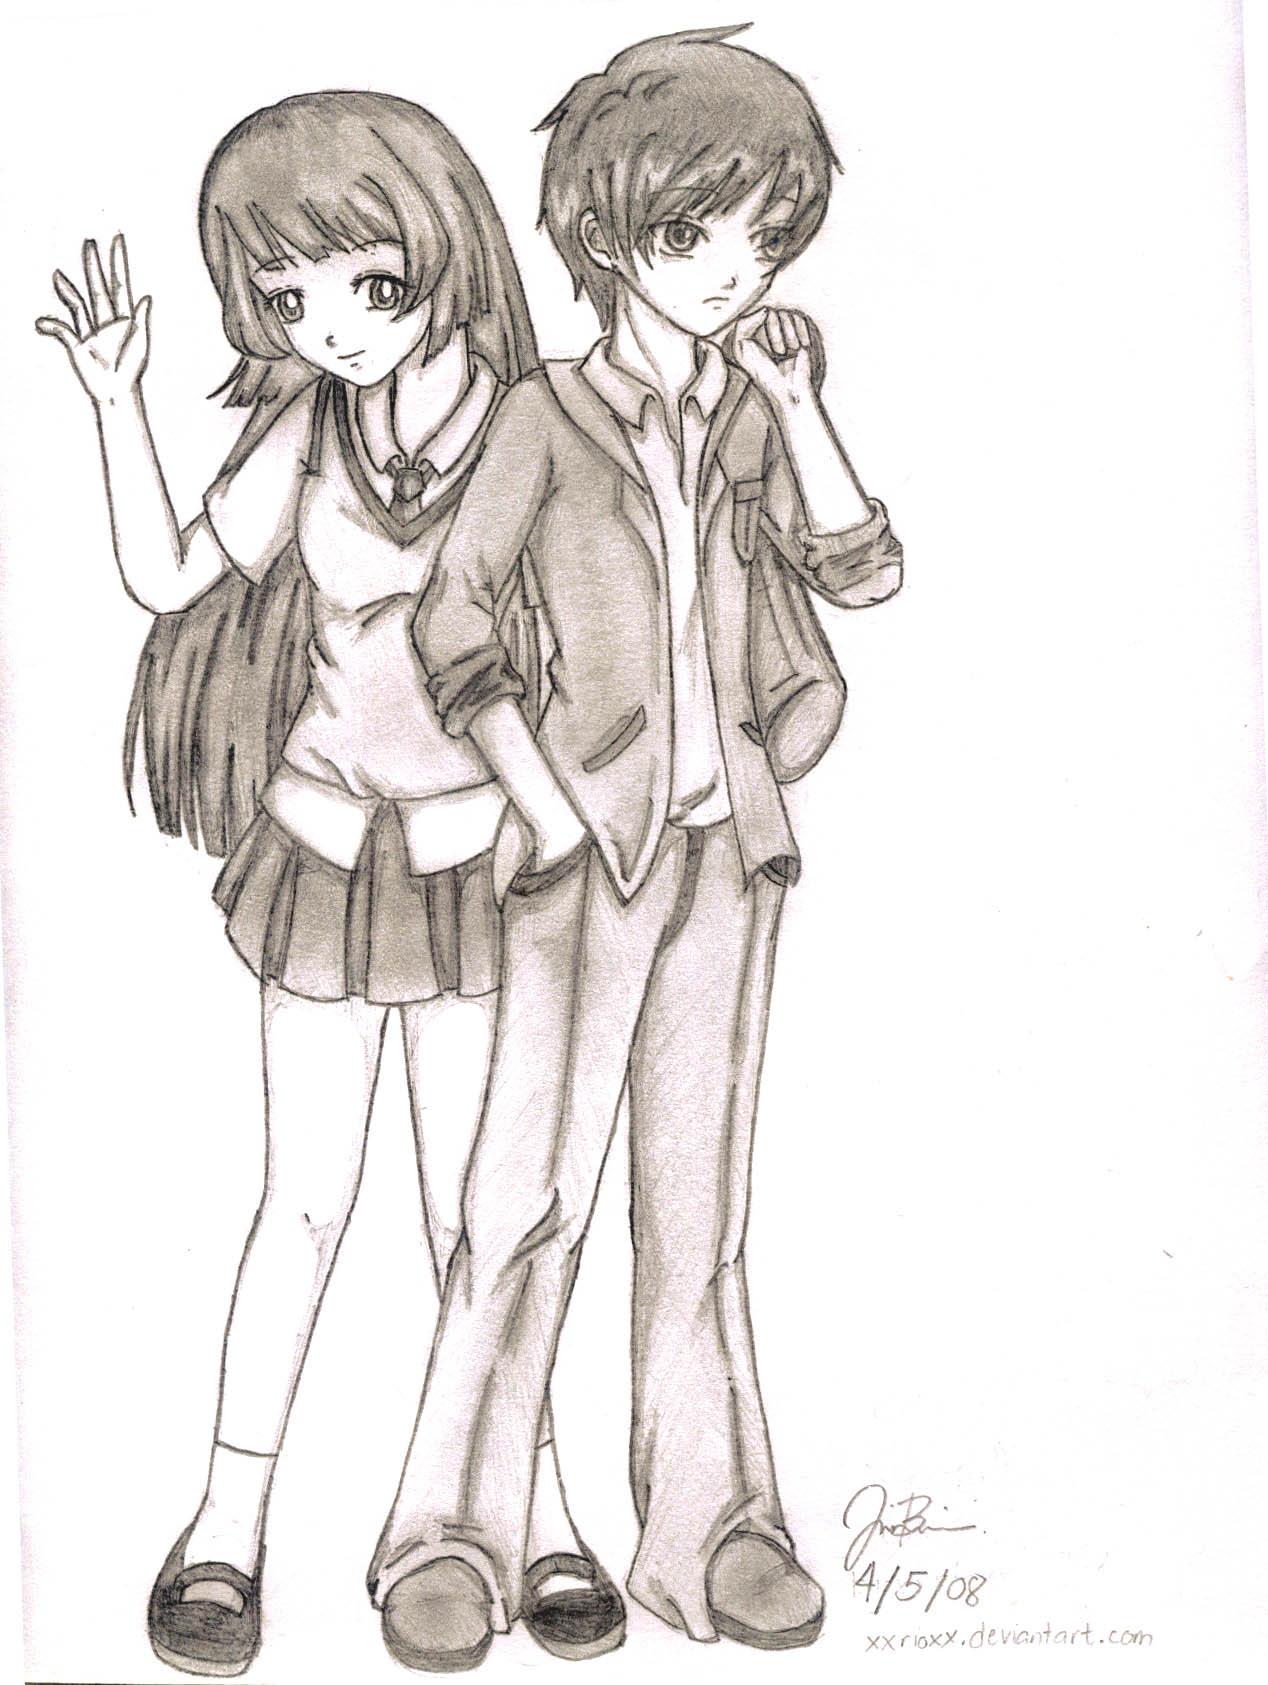 Random Anime Couple by xxrioxx on DeviantArt